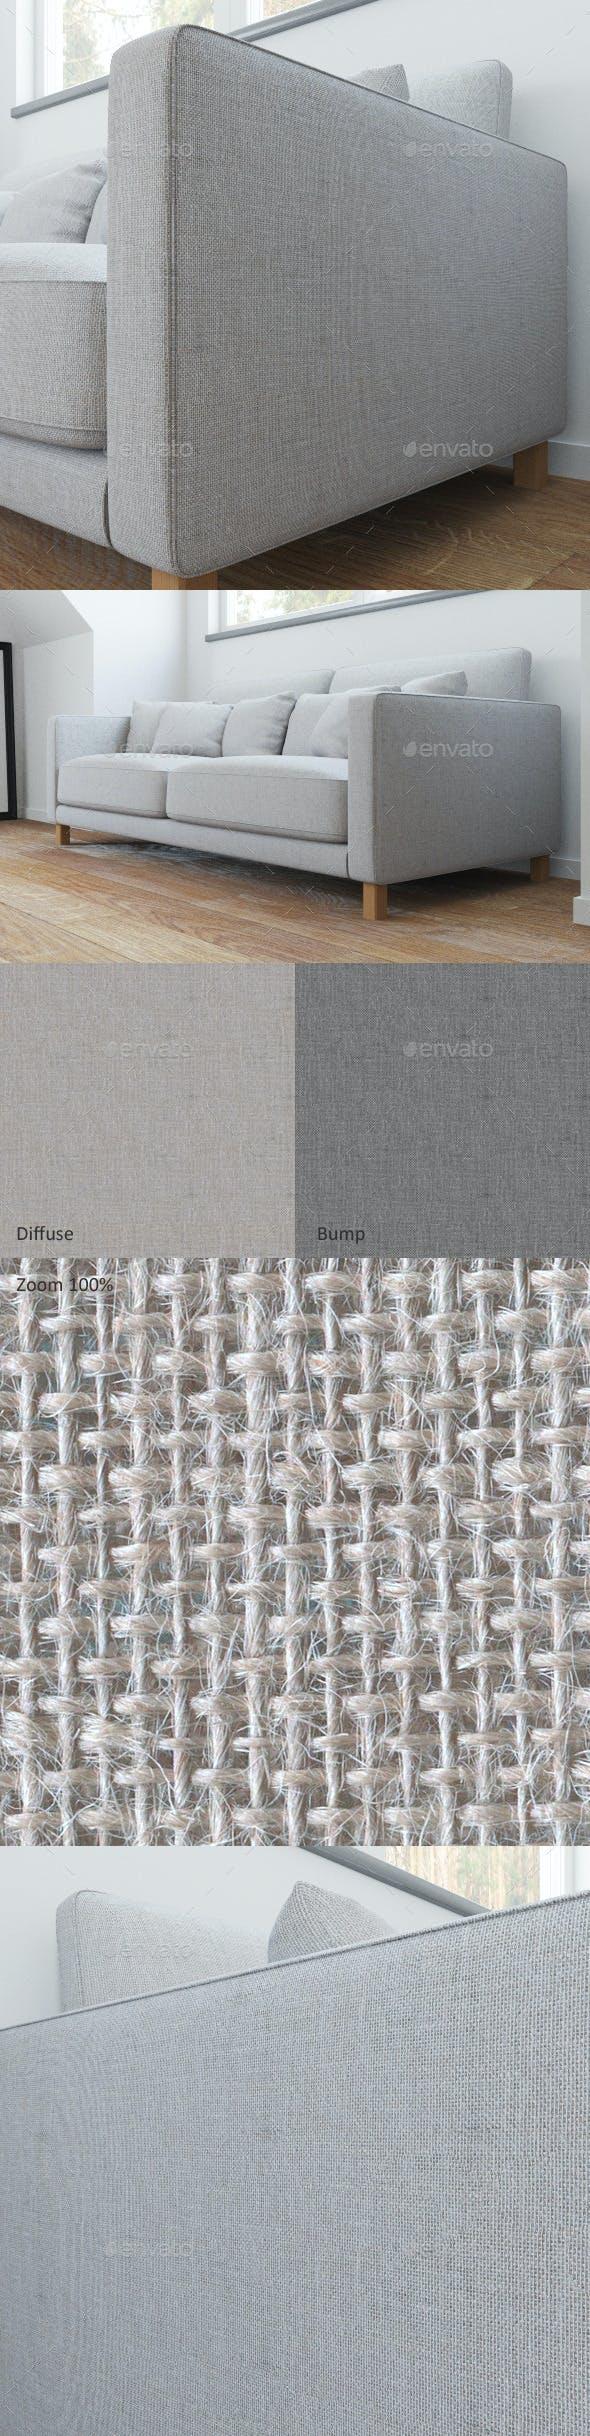 Sofa linen seamless texture - 3DOcean Item for Sale